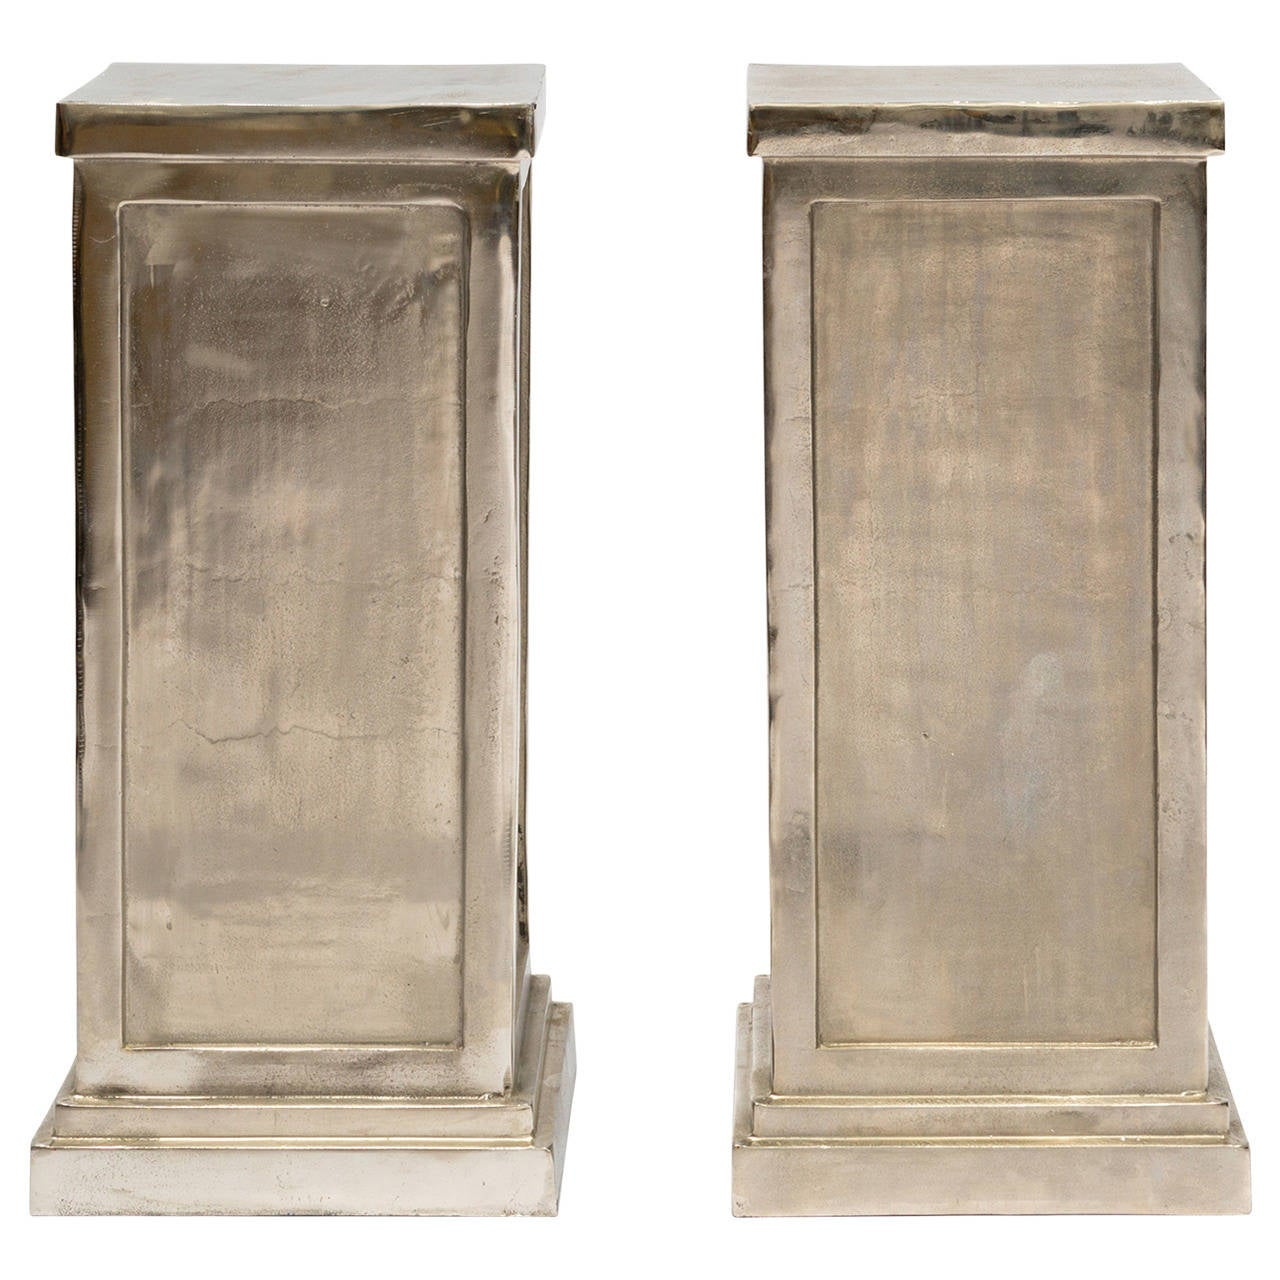 Pair of Metal Alloy Pedestals